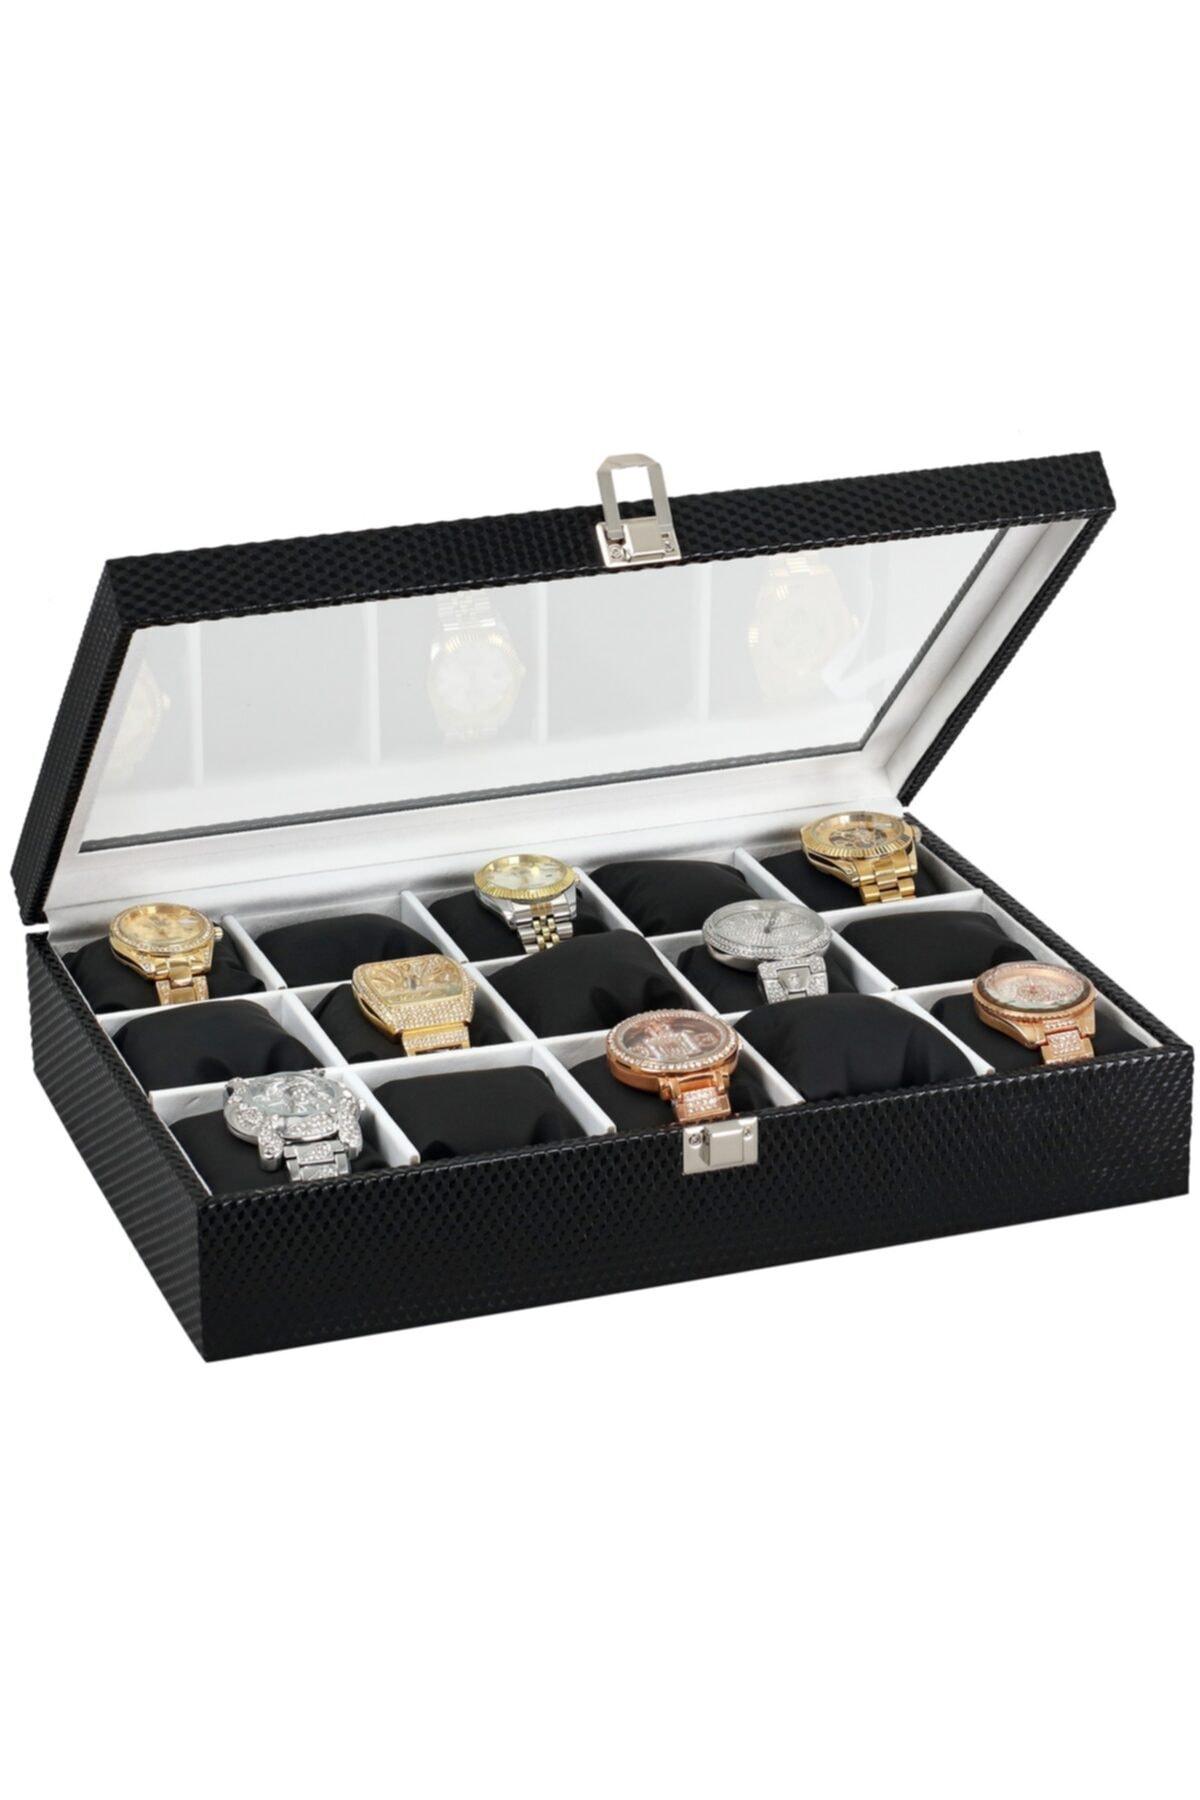 Chavin 15 Li Diamond Siyah Deri Ahşap Üzeri Cam Saat Kutusu St15-20 1